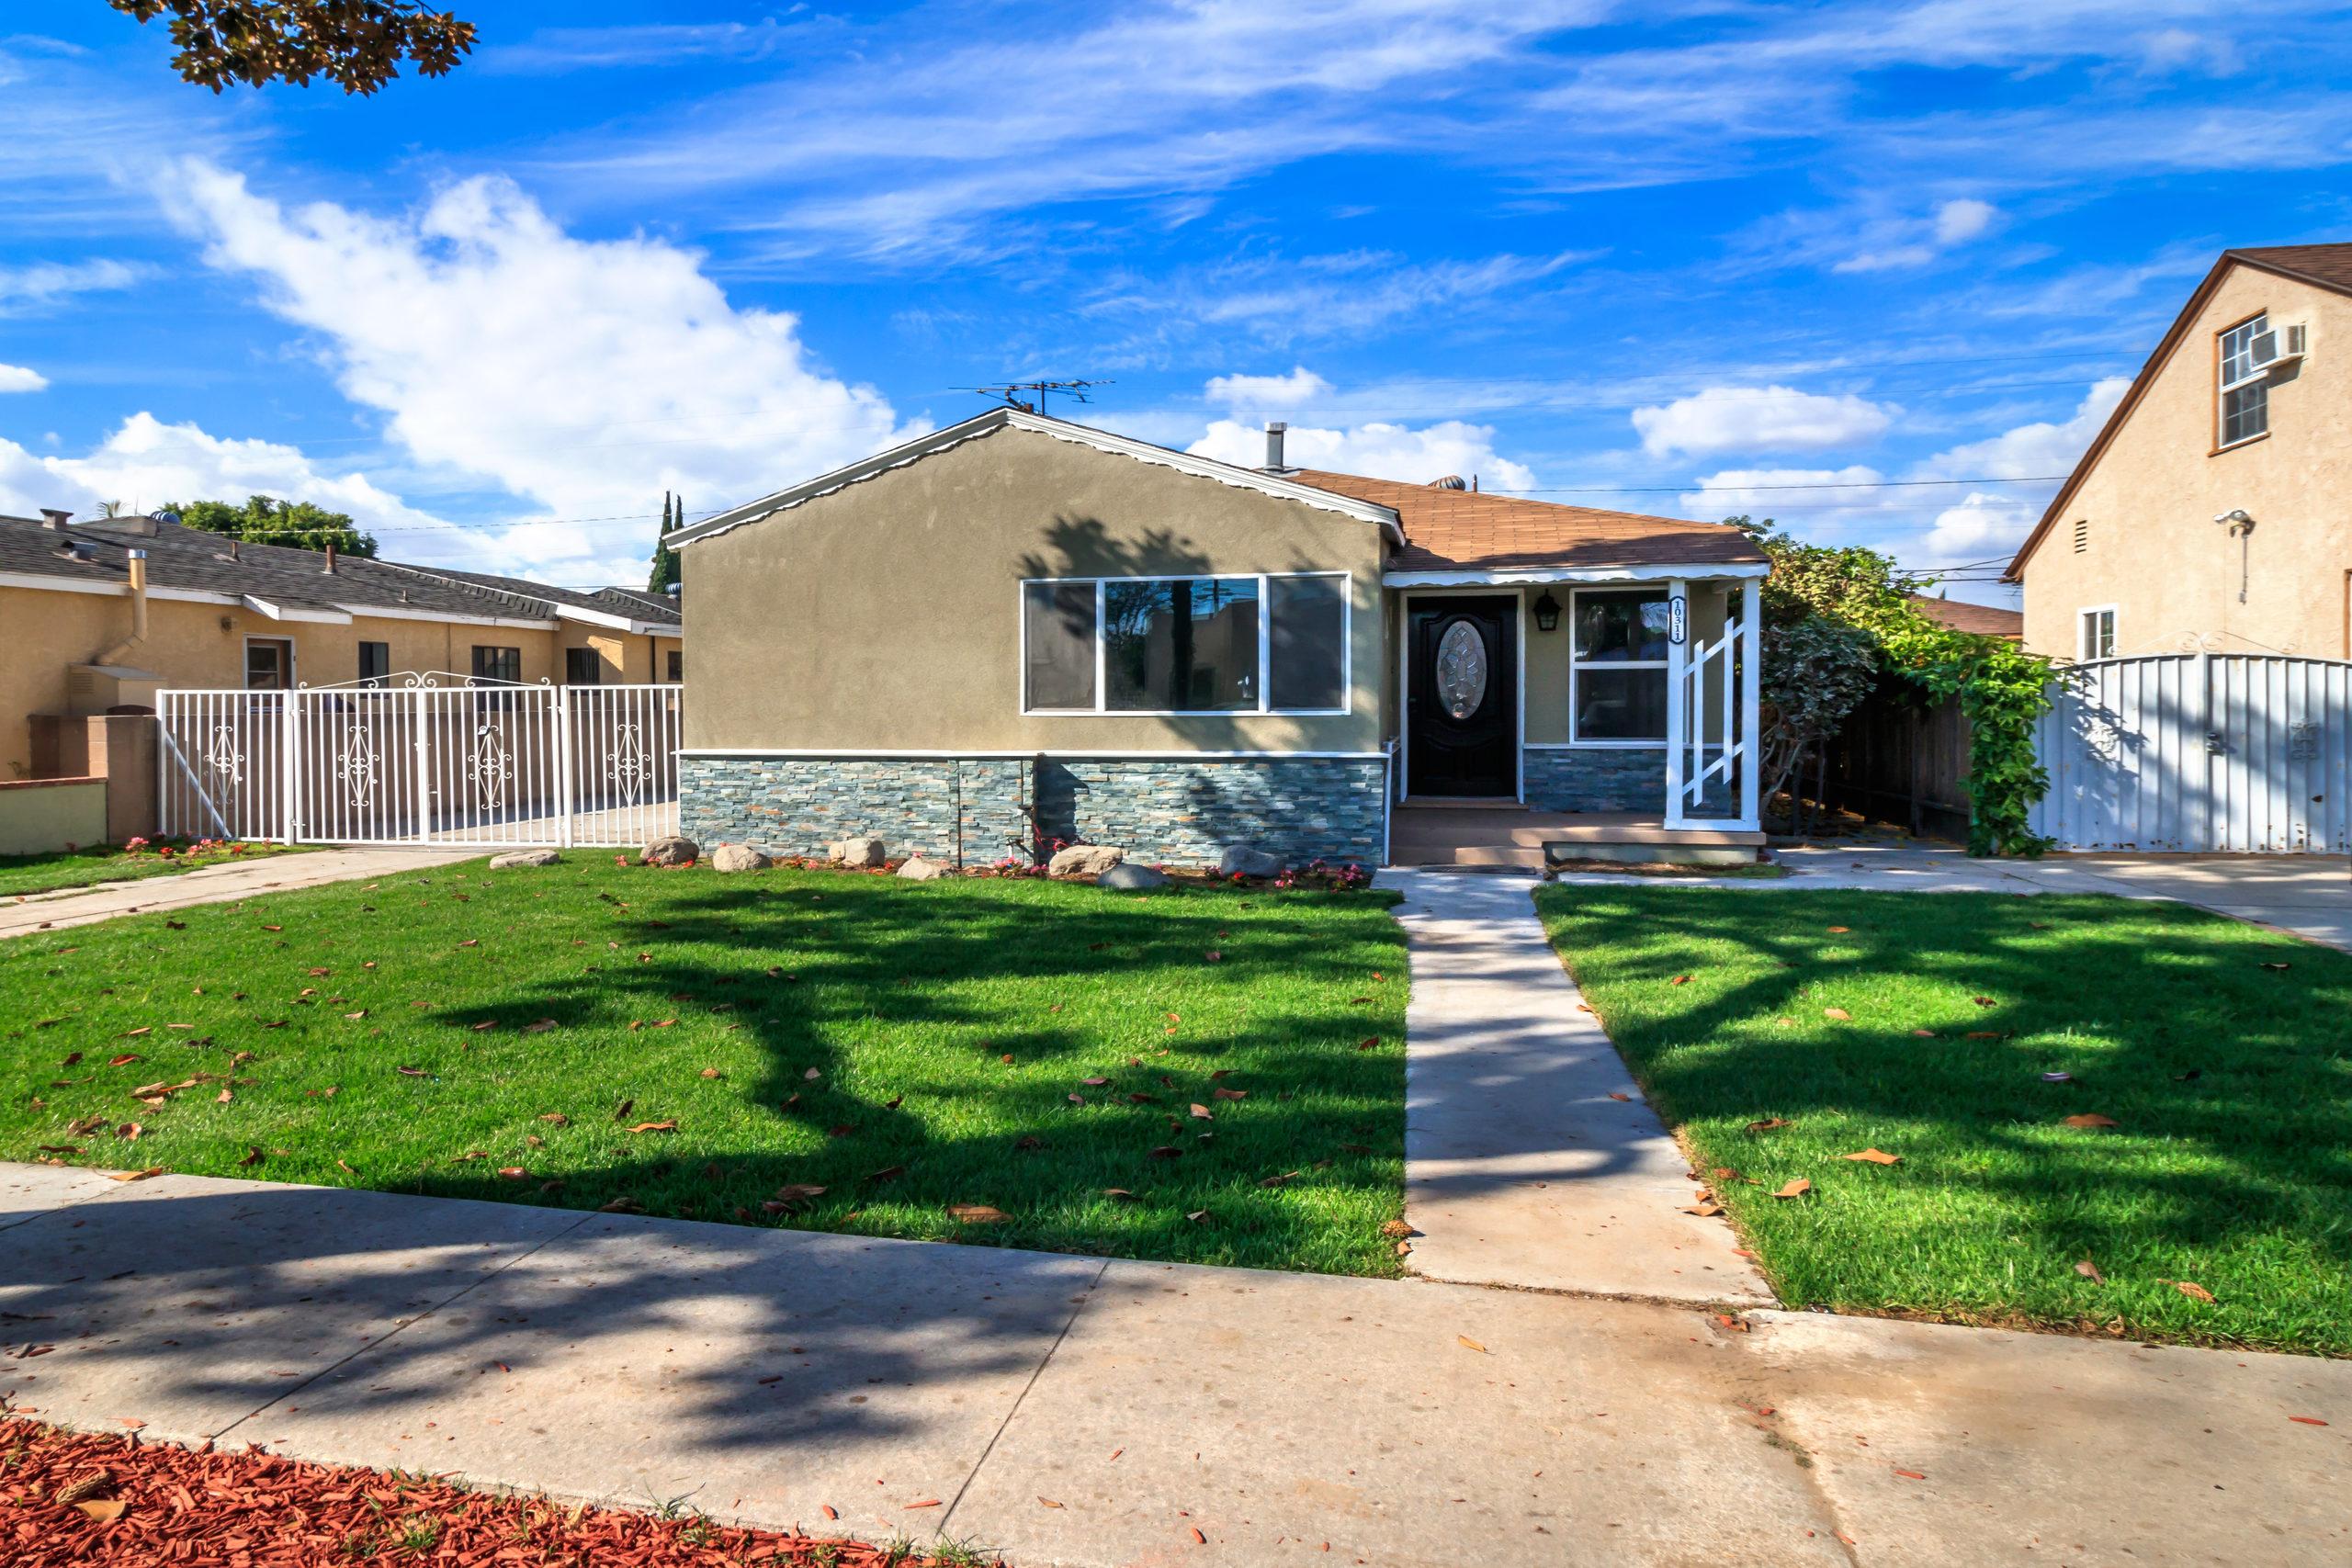 10311 Mcnerney Ave, South Gate, CA 90280